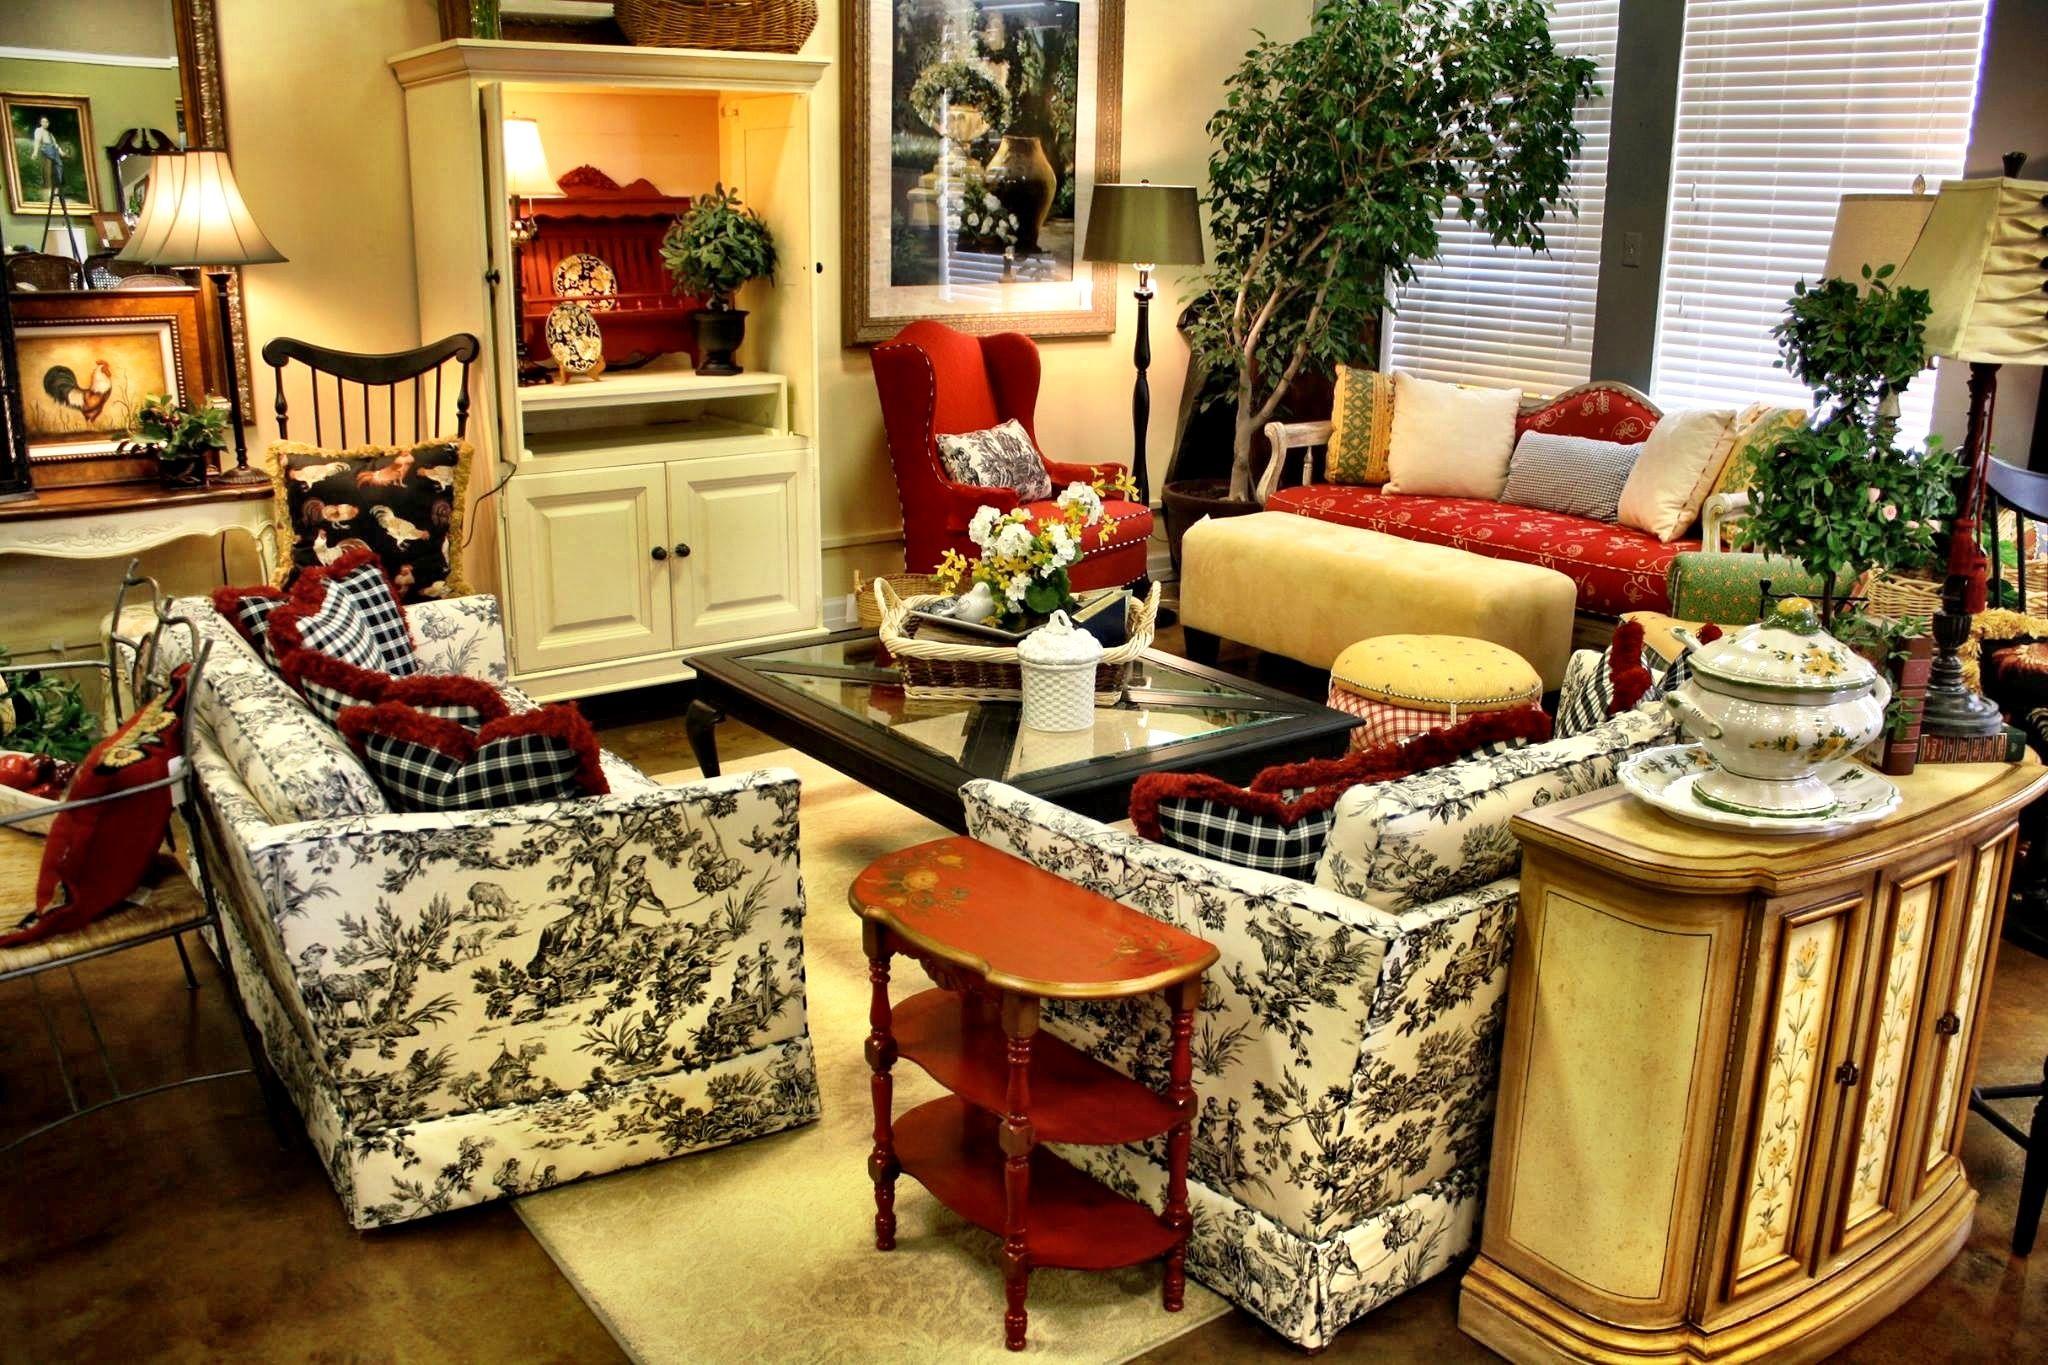 Resale Site For Home Decor and Fashion   POPSUGAR Home